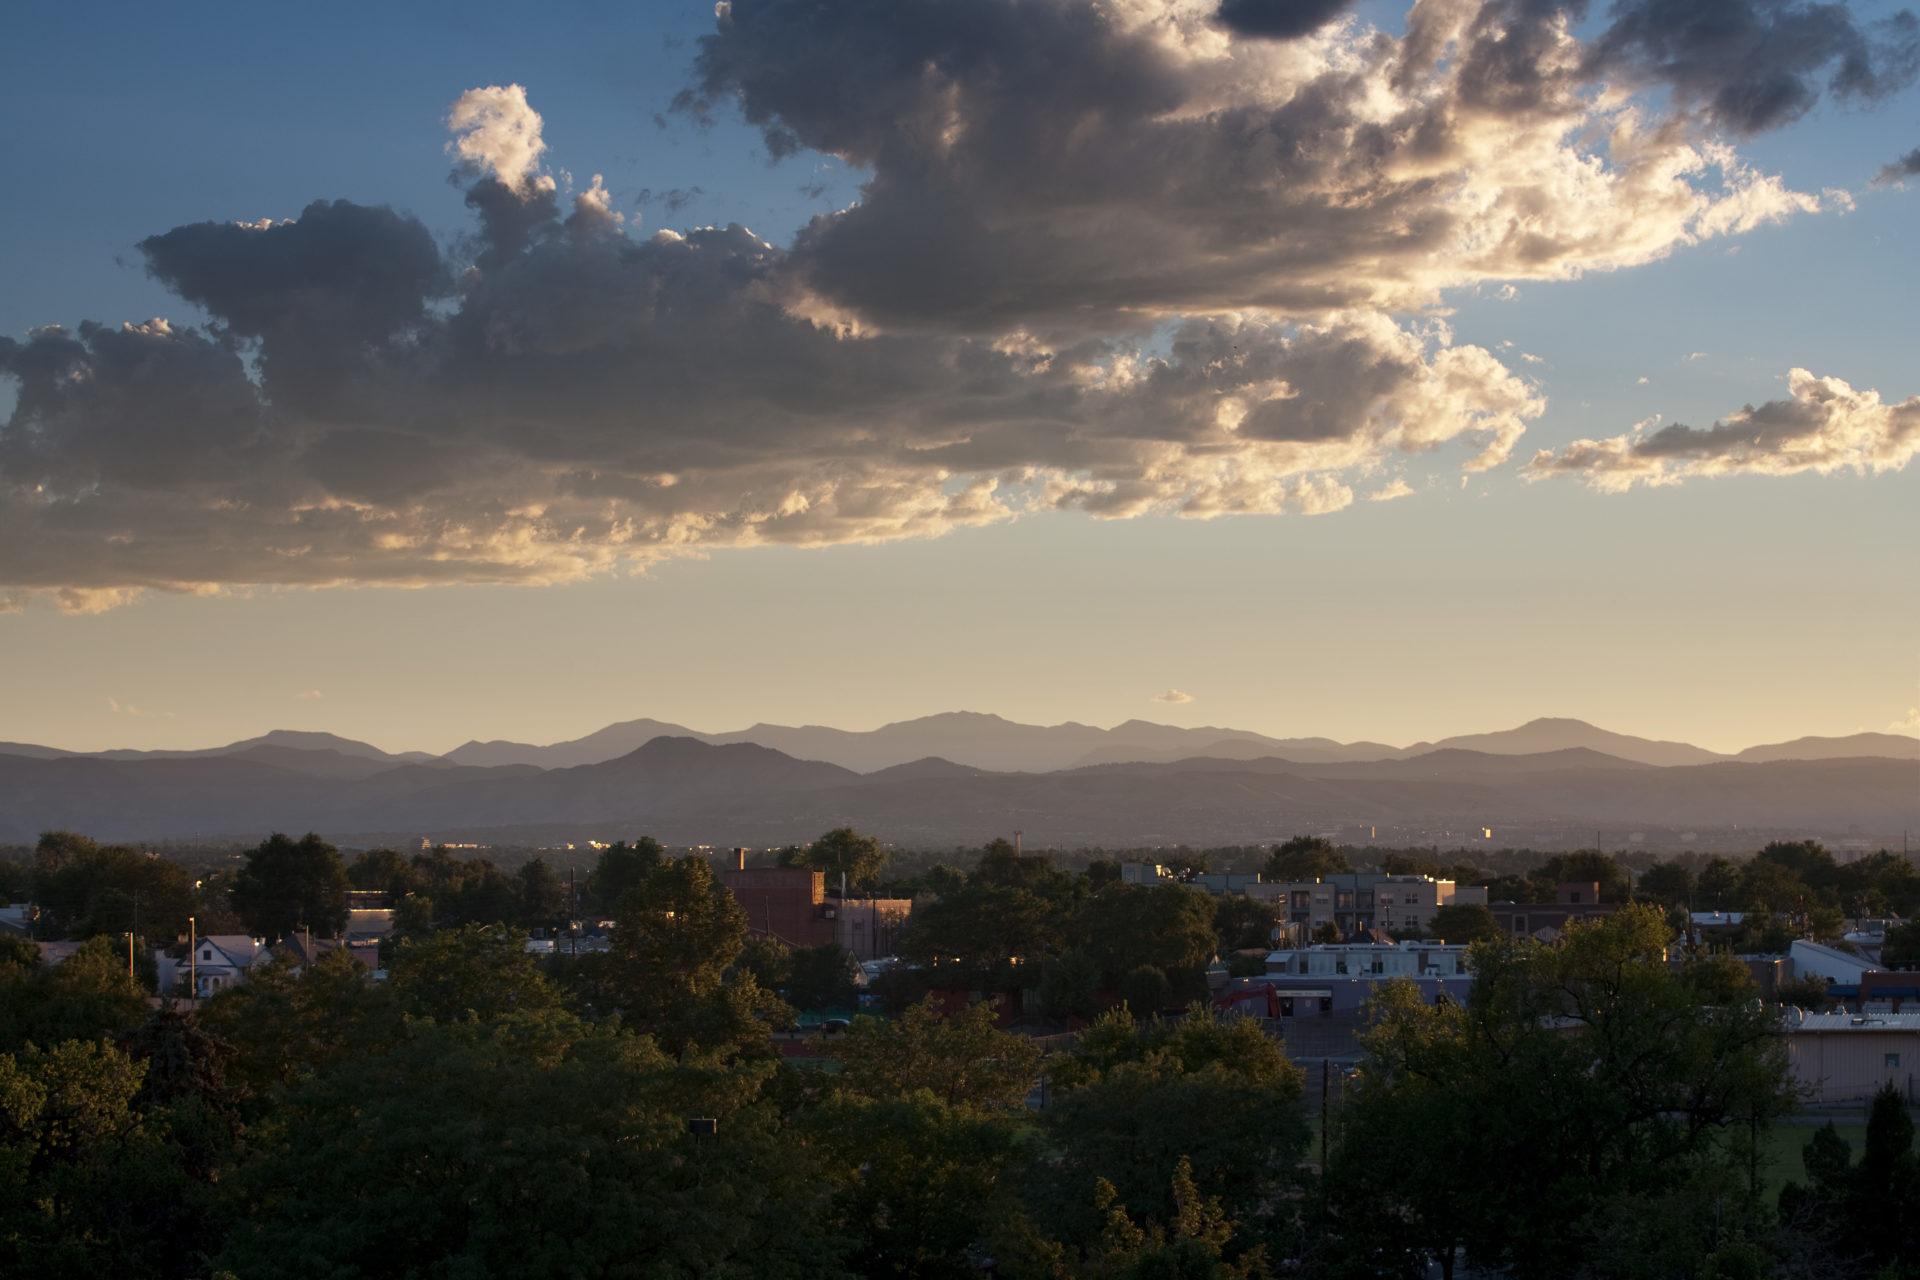 Mount Evans sunset - August 6, 2011